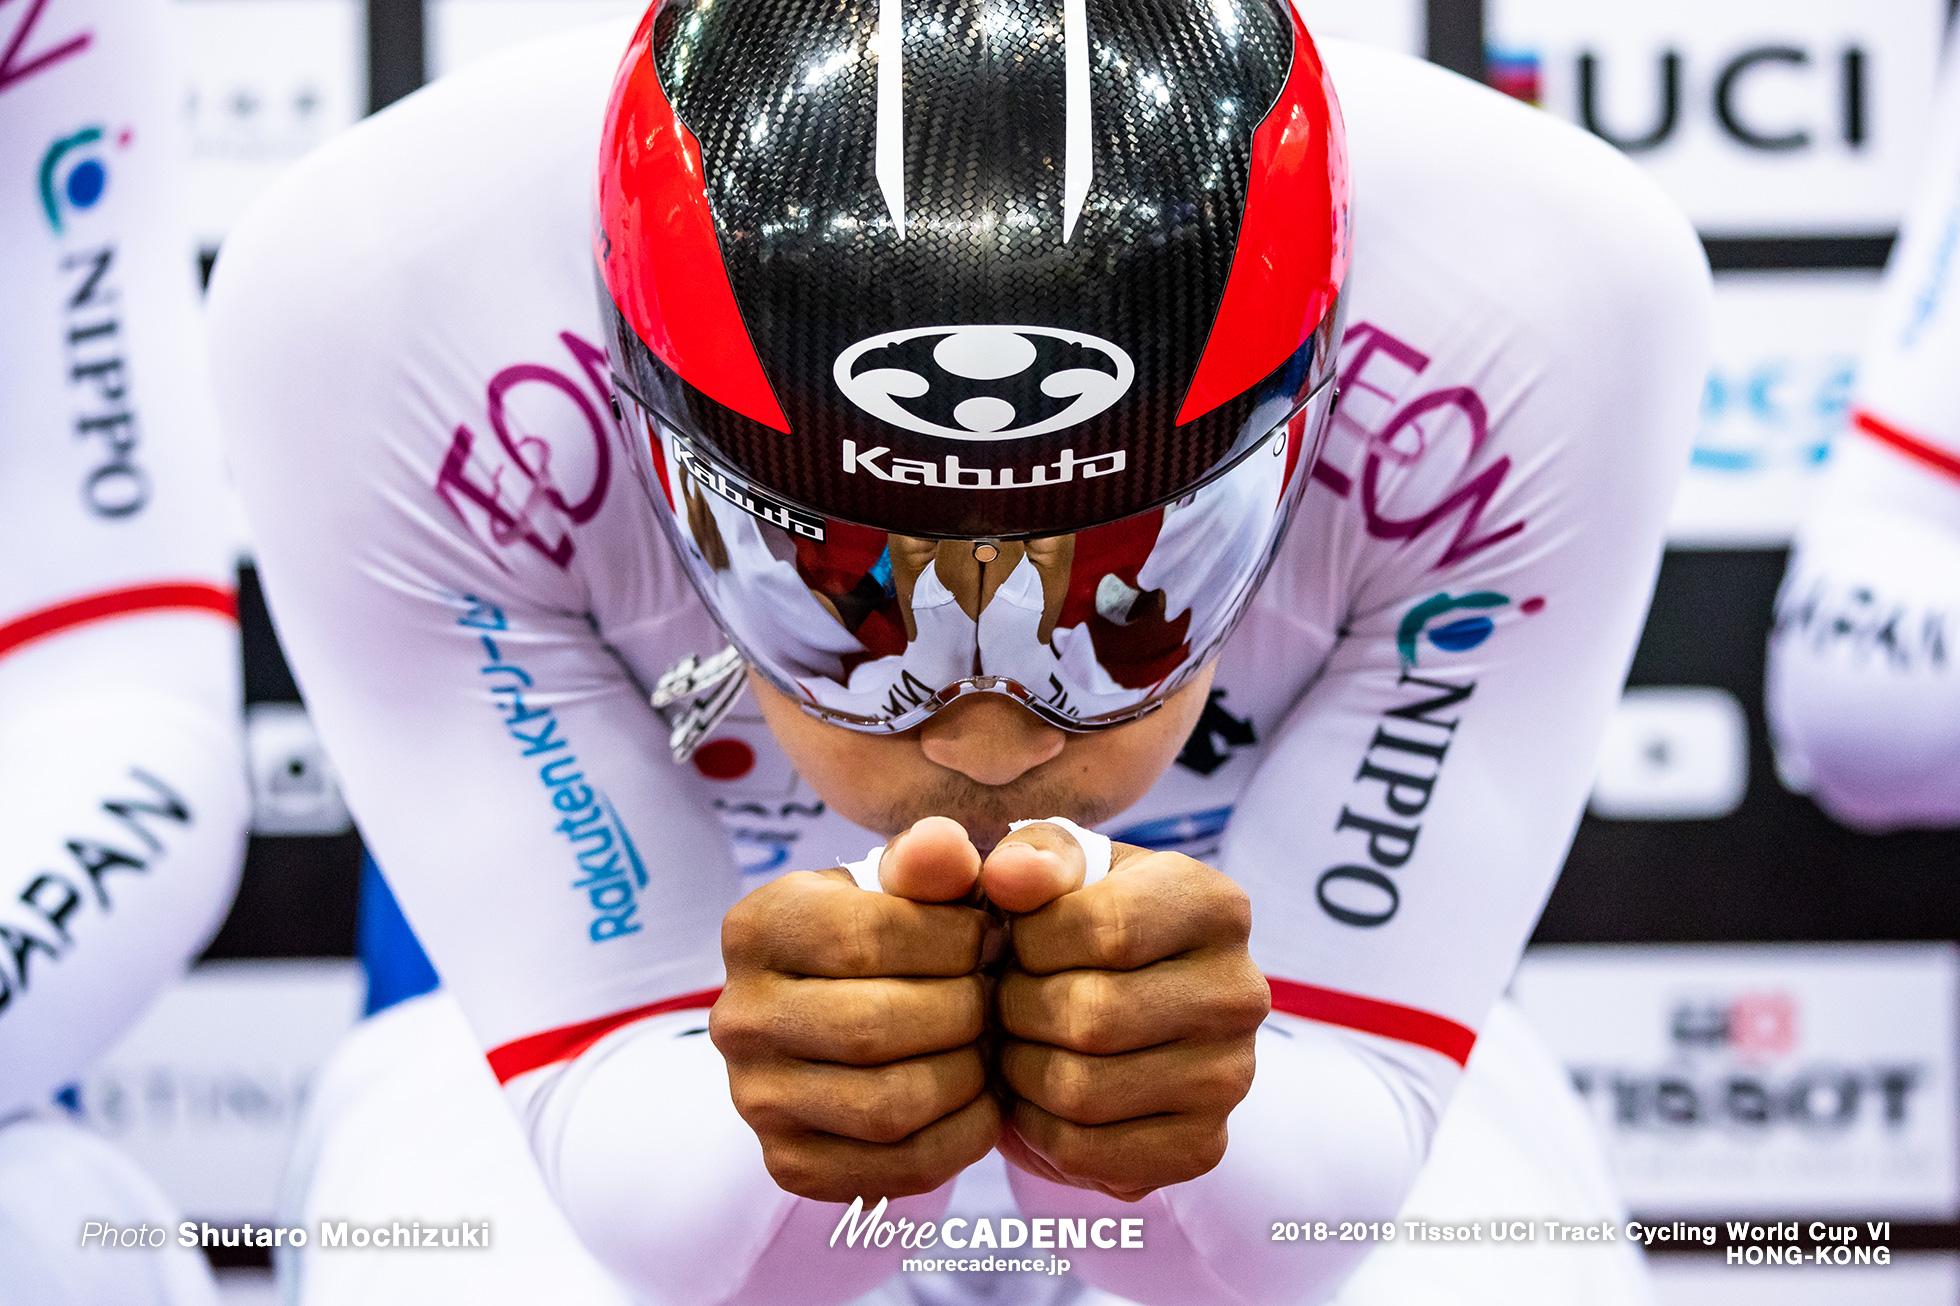 Qualifying / Men's Team Pursuit / Track Cycling World Cup VI / Hong-Kong